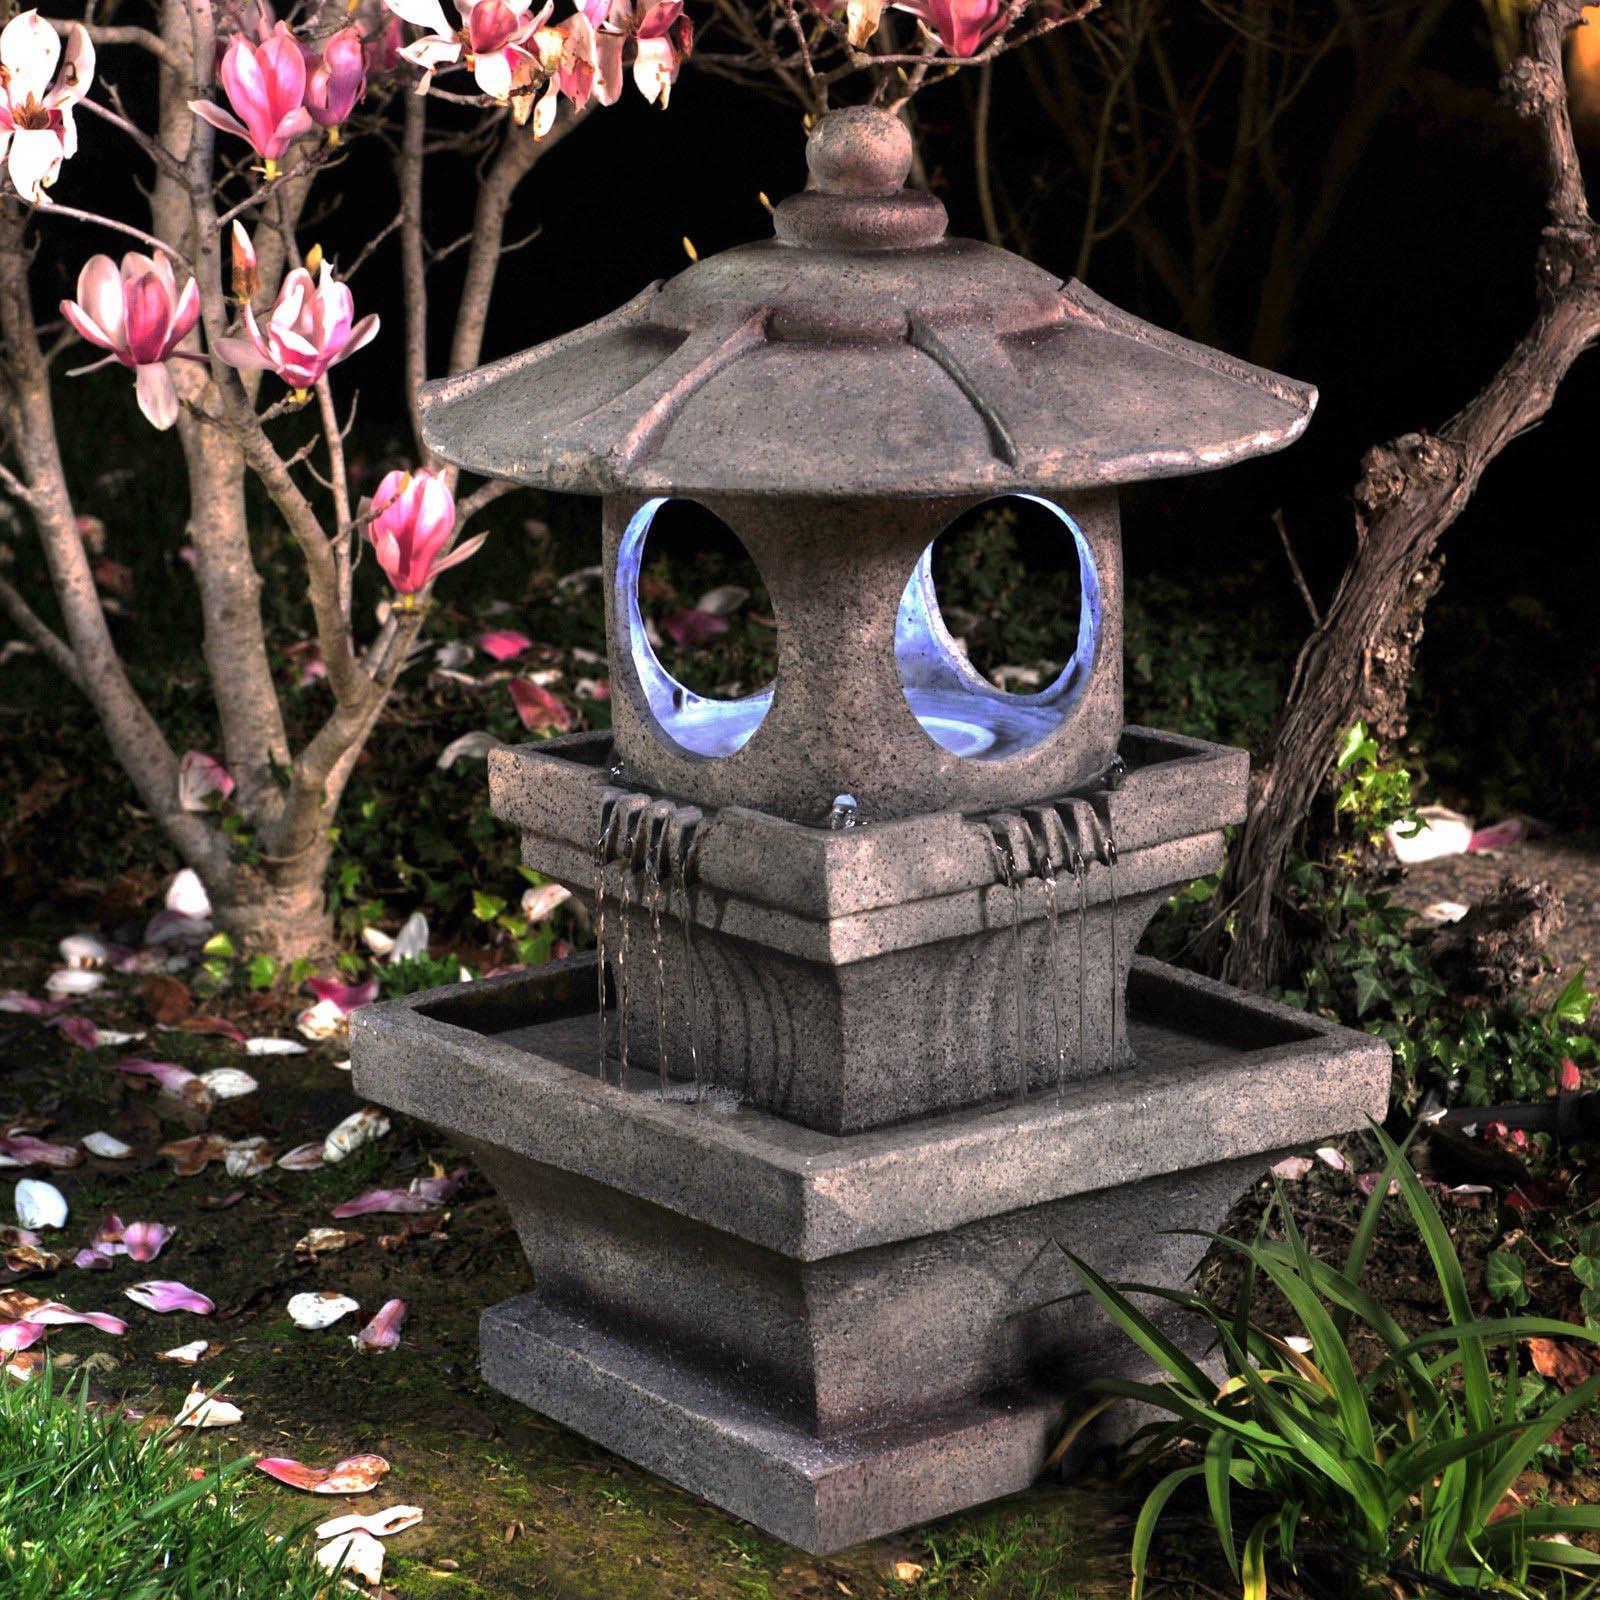 Lighted Garden Fountains